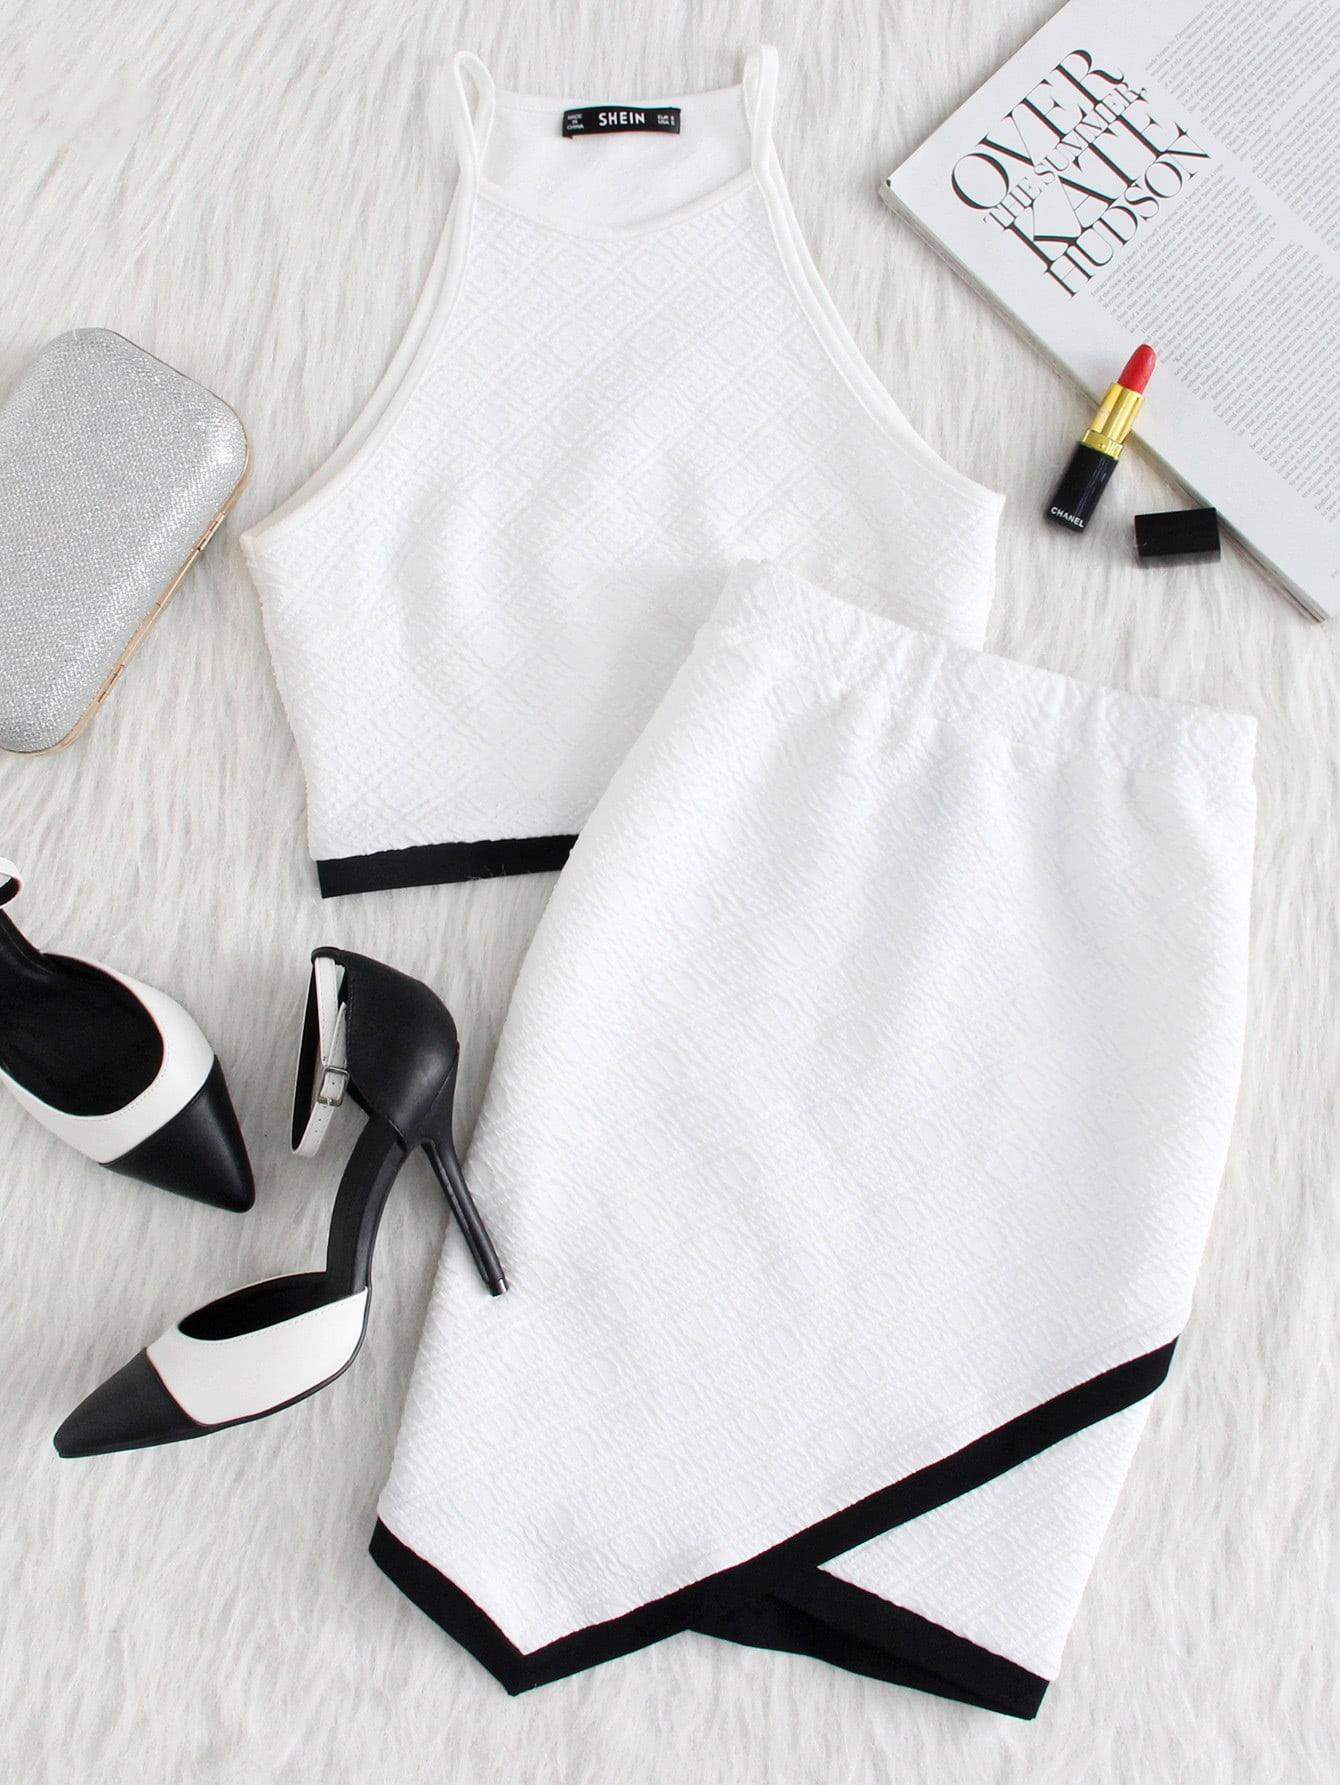 Contrast Binding Hem Textured Top And Overlap Skirt Set ornate print textured skirt